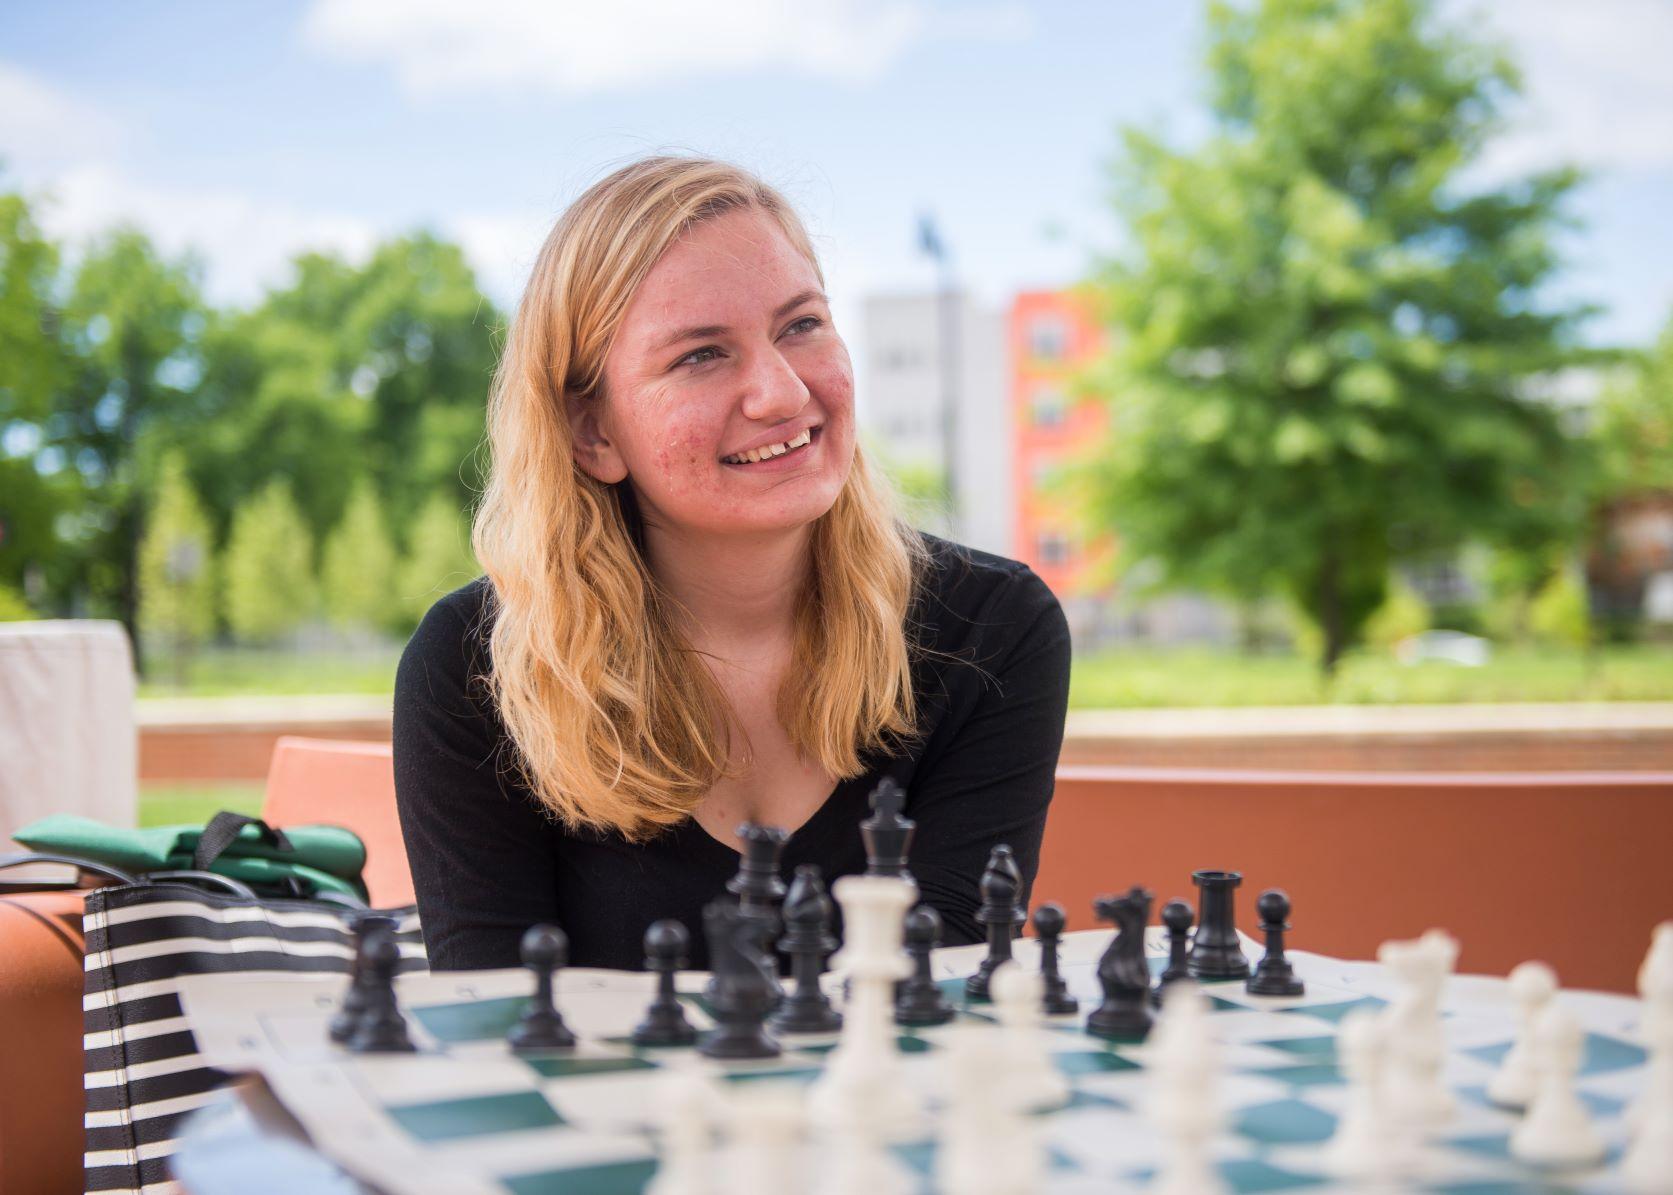 Queens Gambit Chess Institute